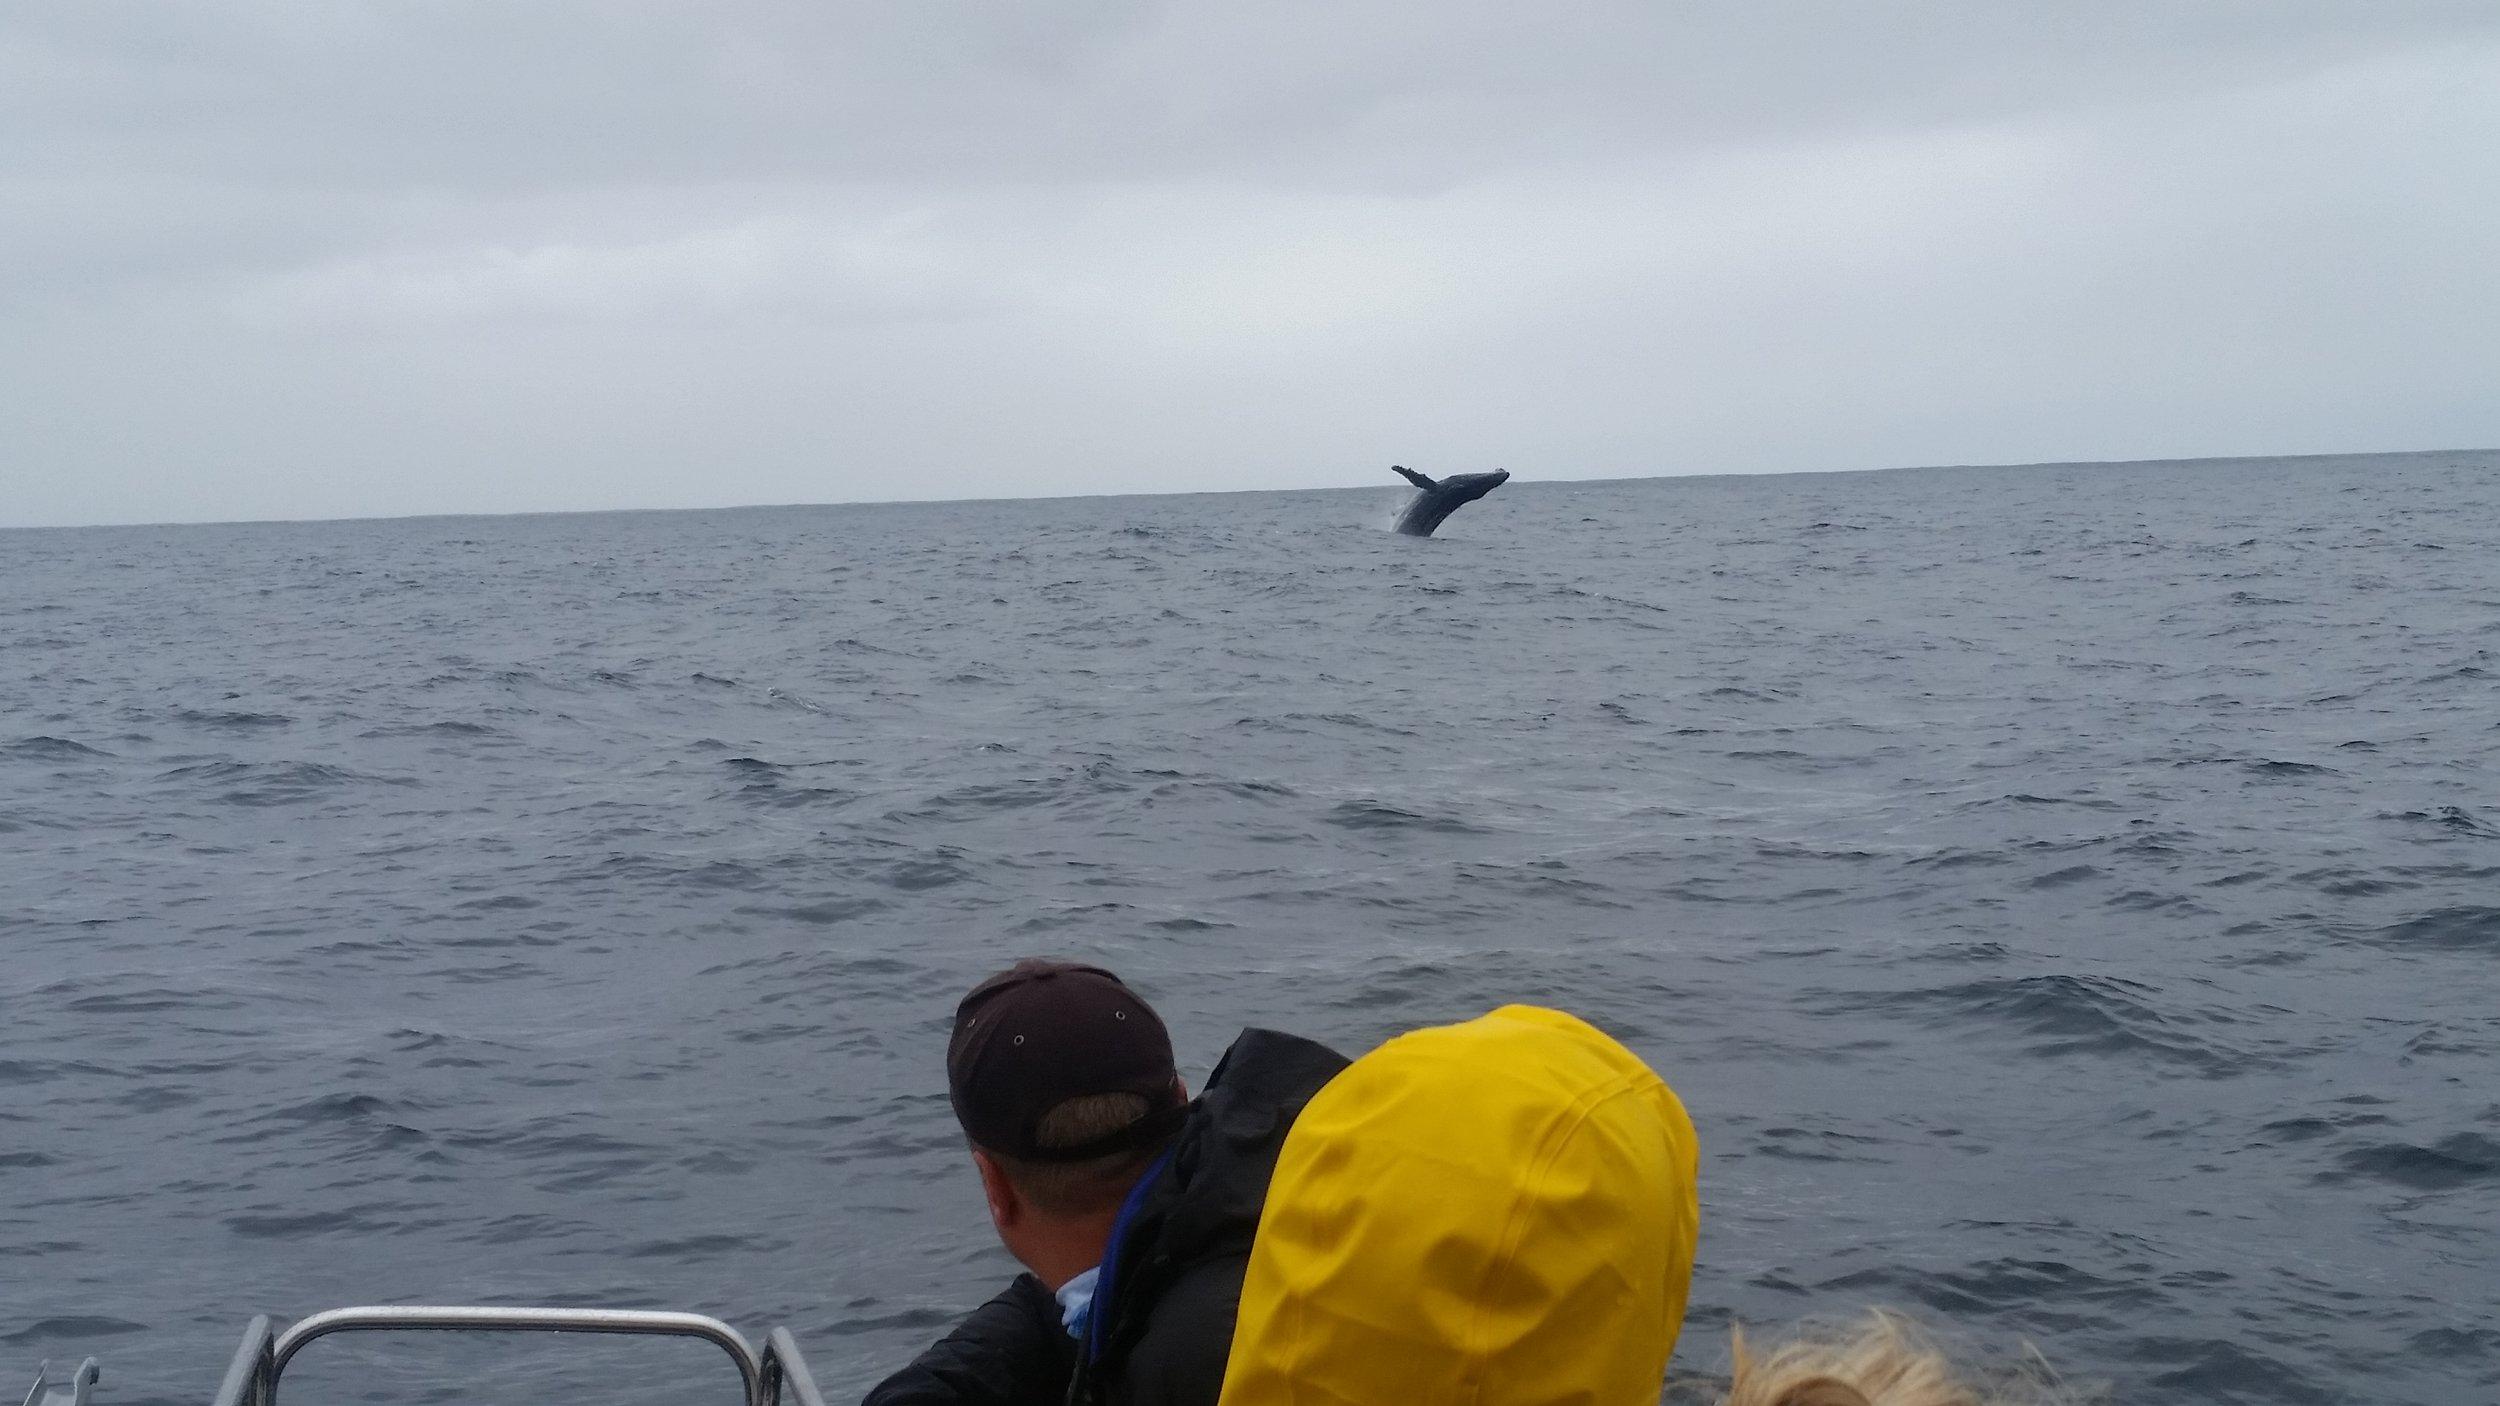 Humpback Whale Breaching on a Pelagic Bird Watching Charter!